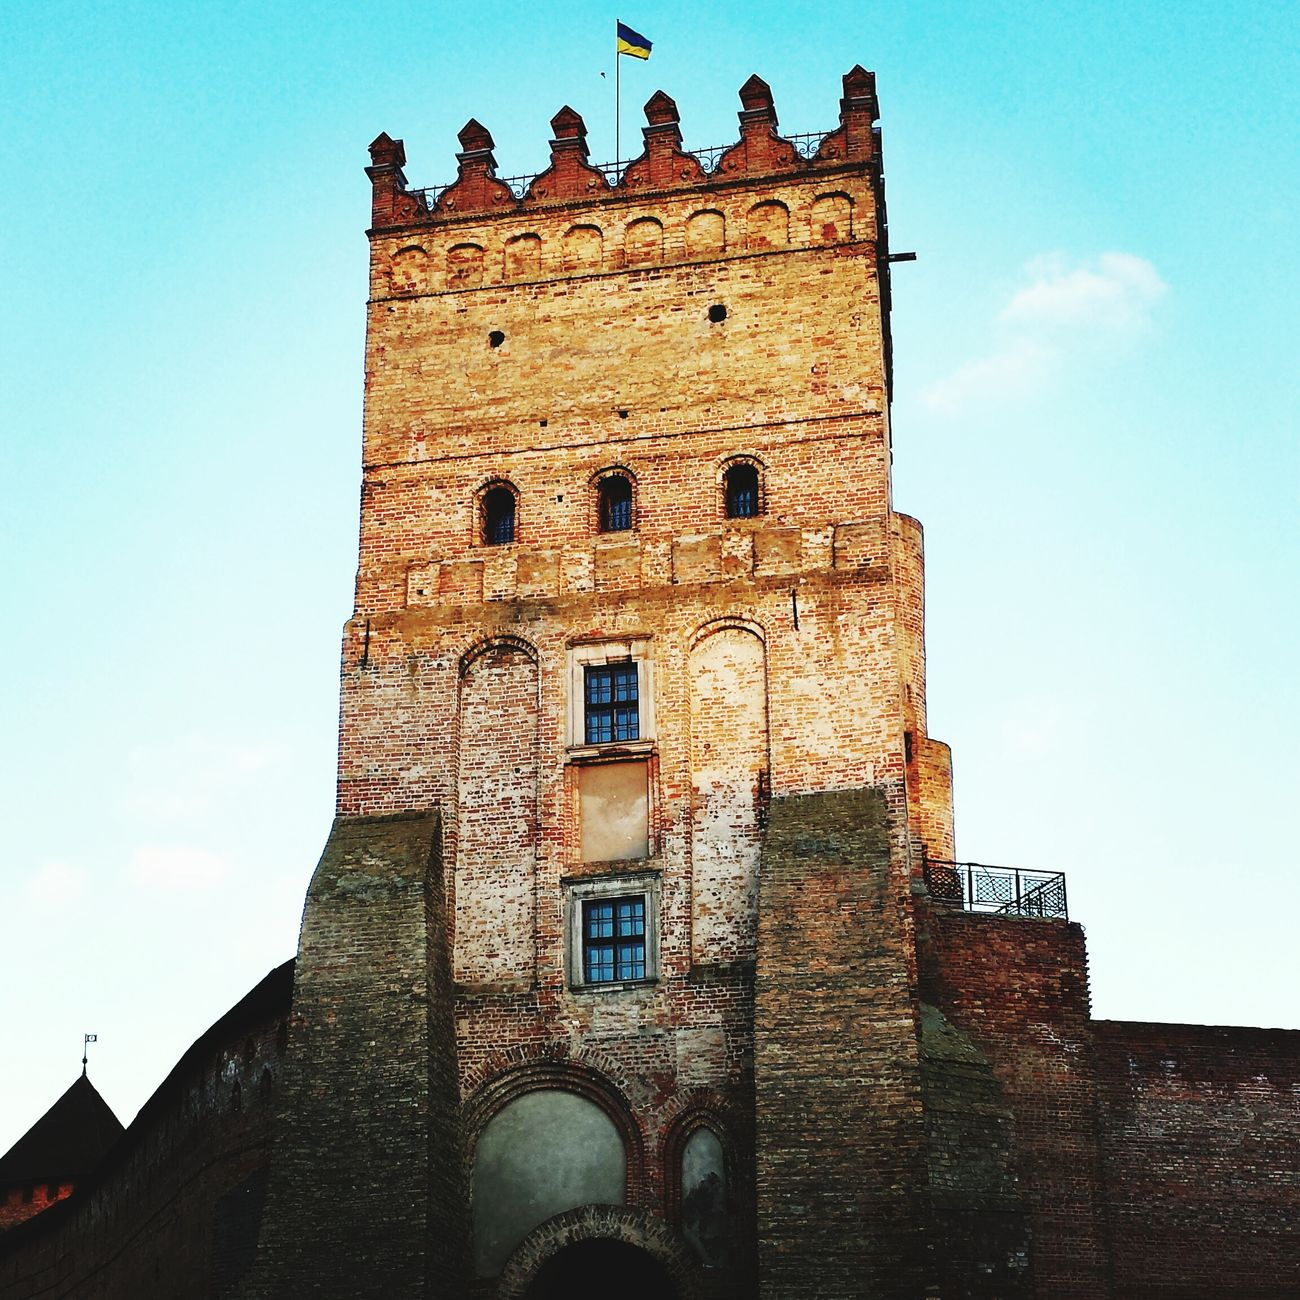 Lubart's Castle